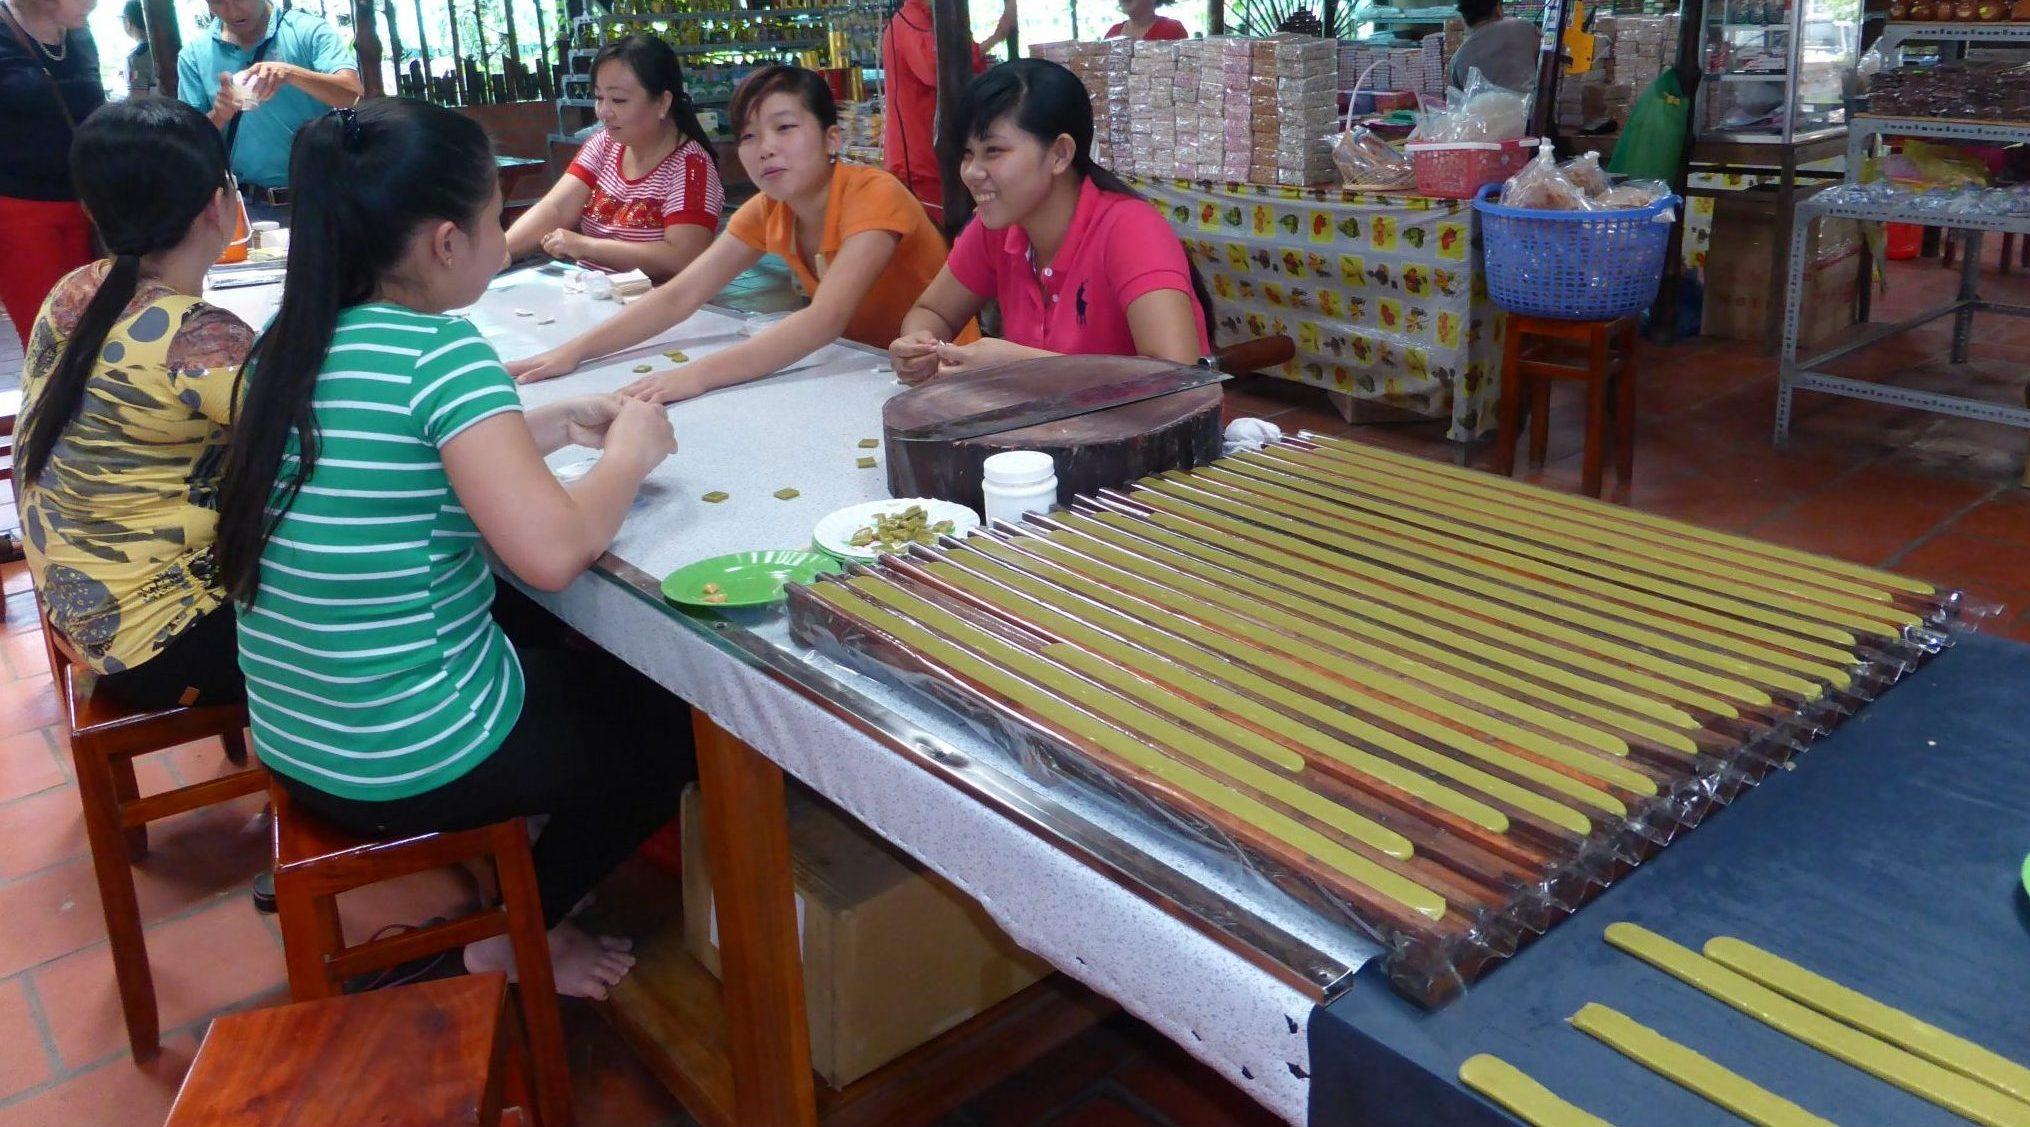 Bonbon noix de coco Mekong